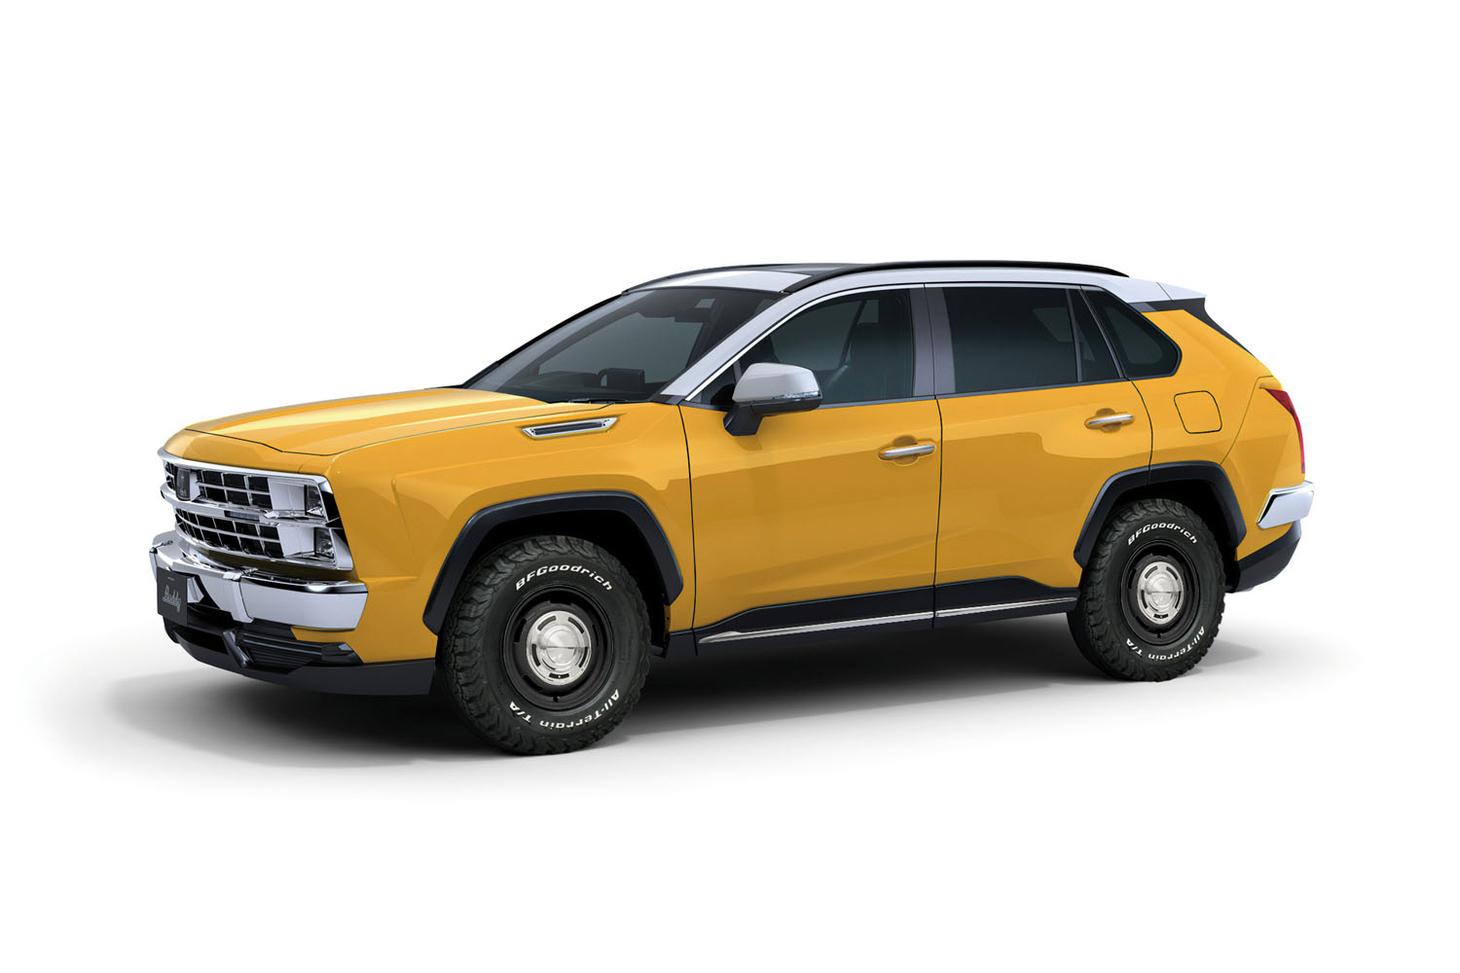 2019 - [Toyota] RAV 4 V - Page 5 Elgvt4SWMAYEabp?format=jpg&name=large